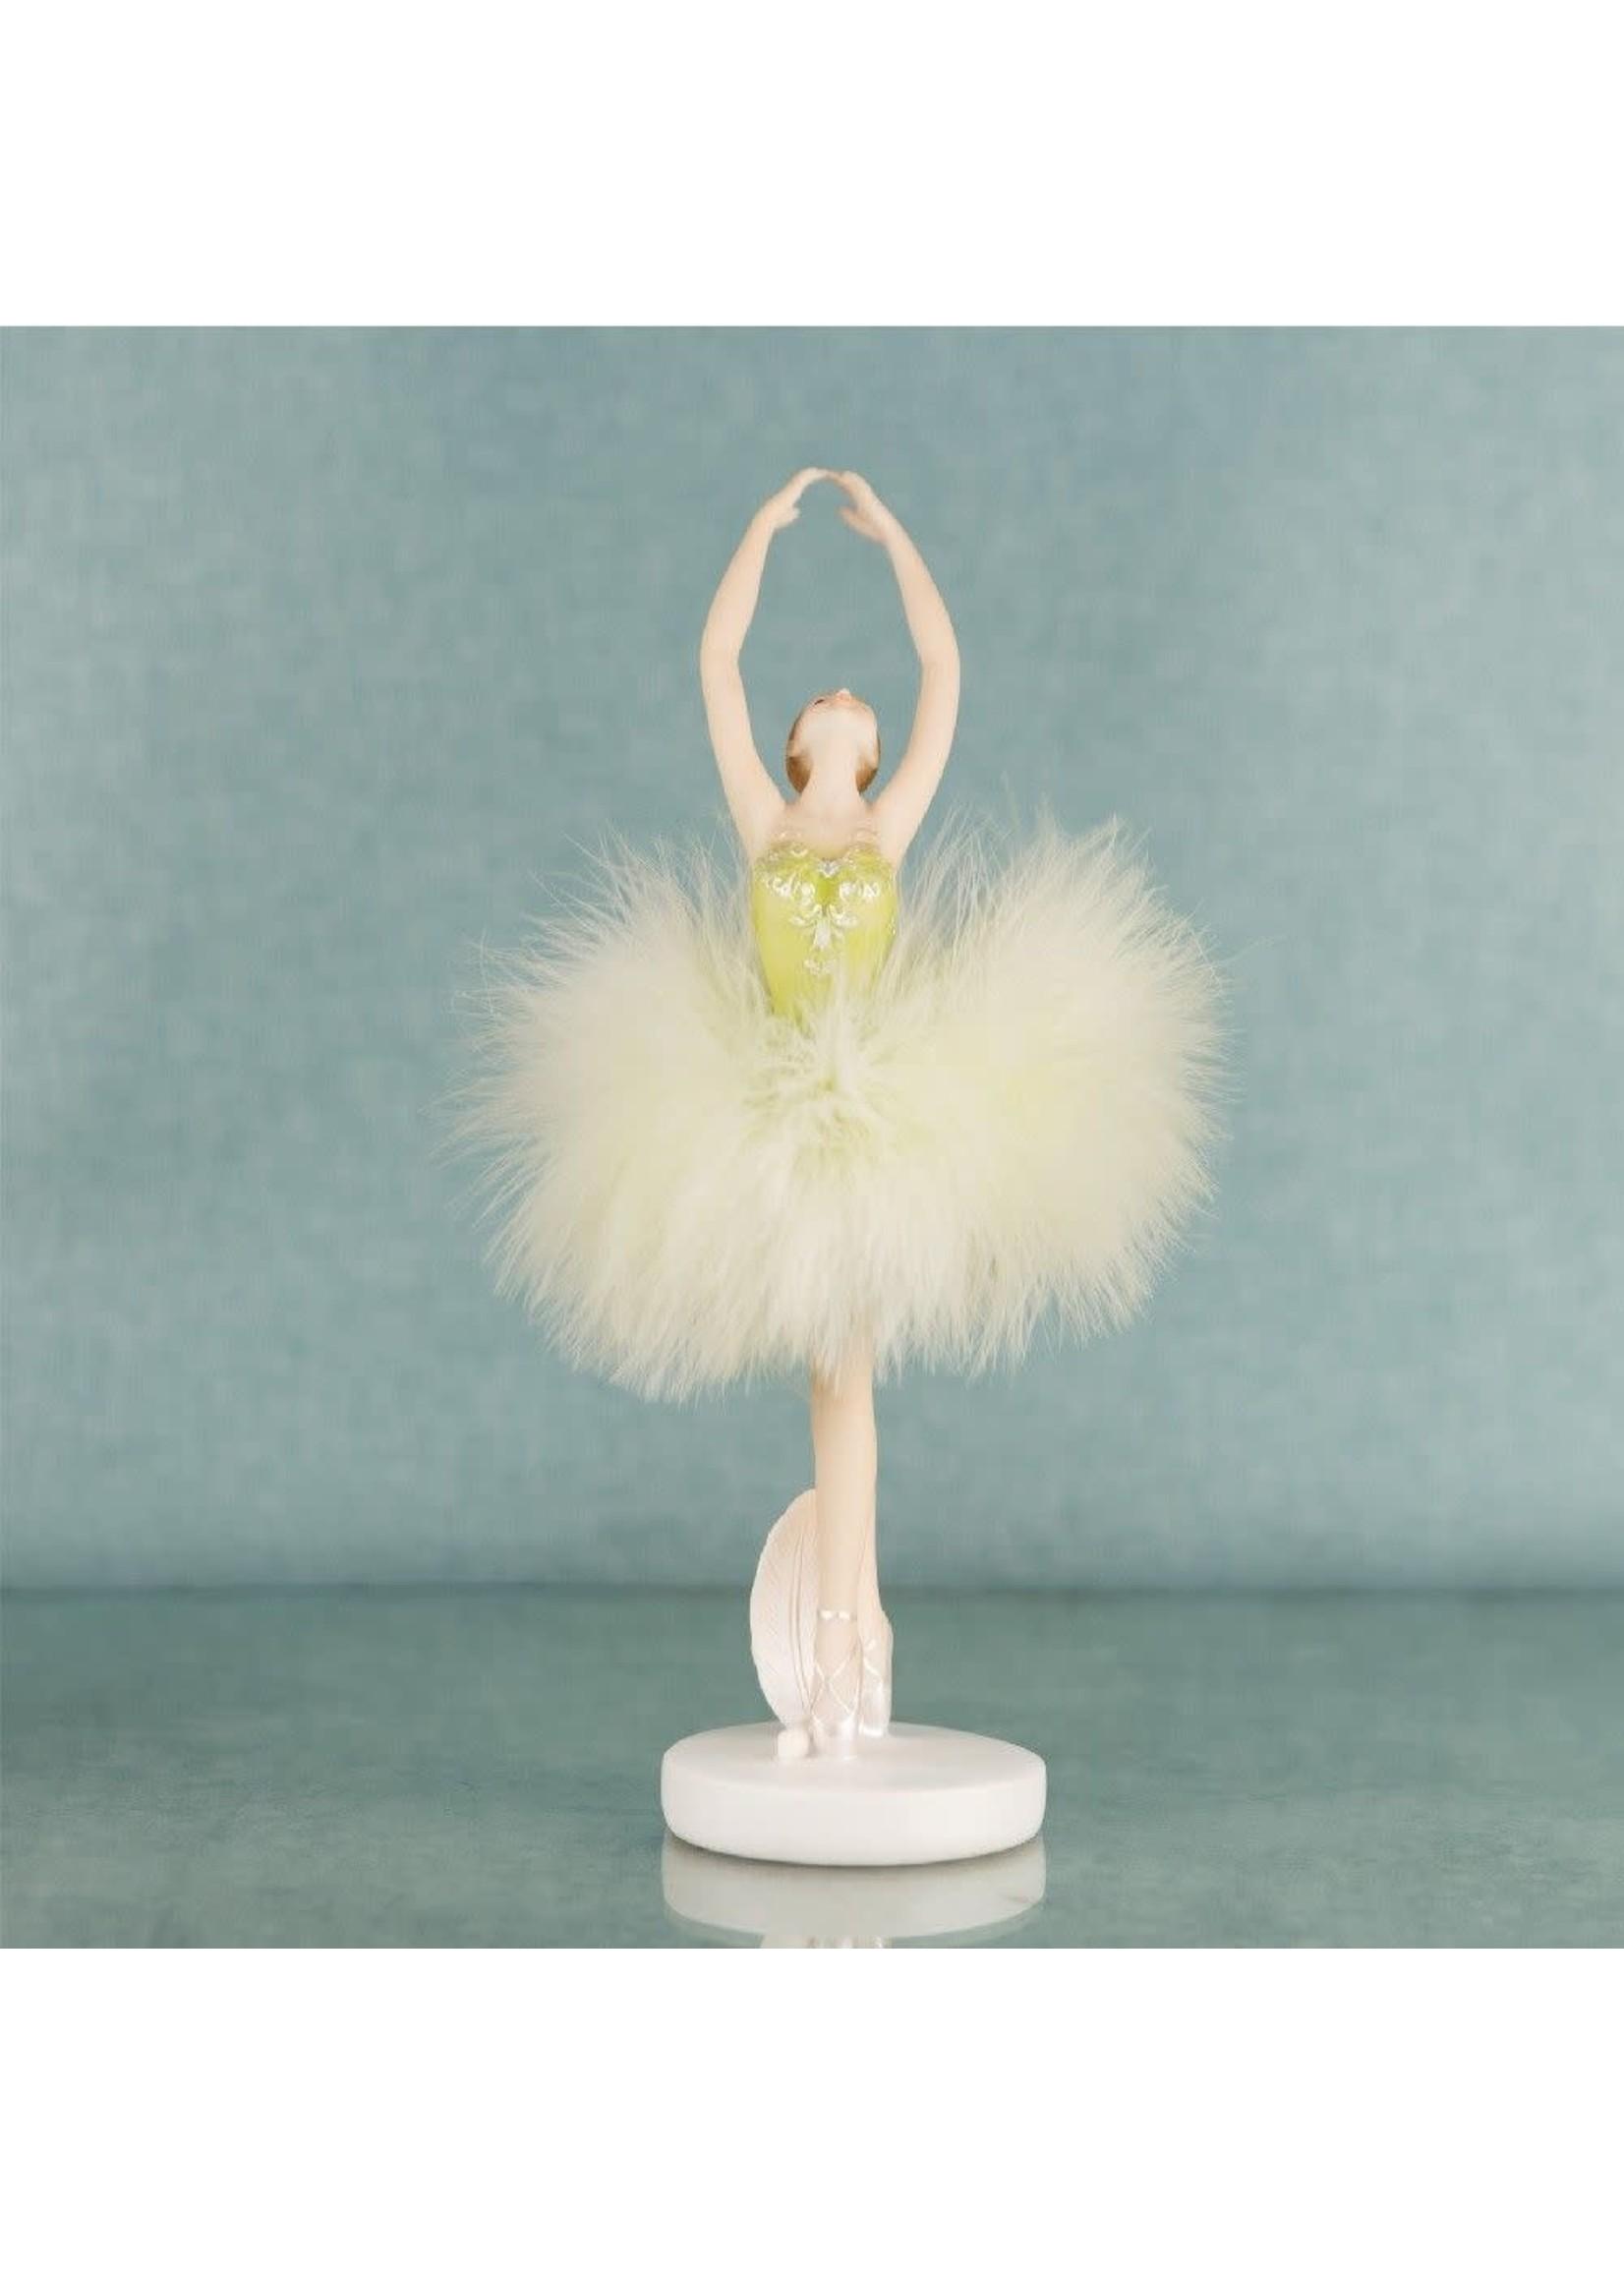 BALLERINA DANCER RESIN FIGURINE IN GREEN DRESS 23.5CM